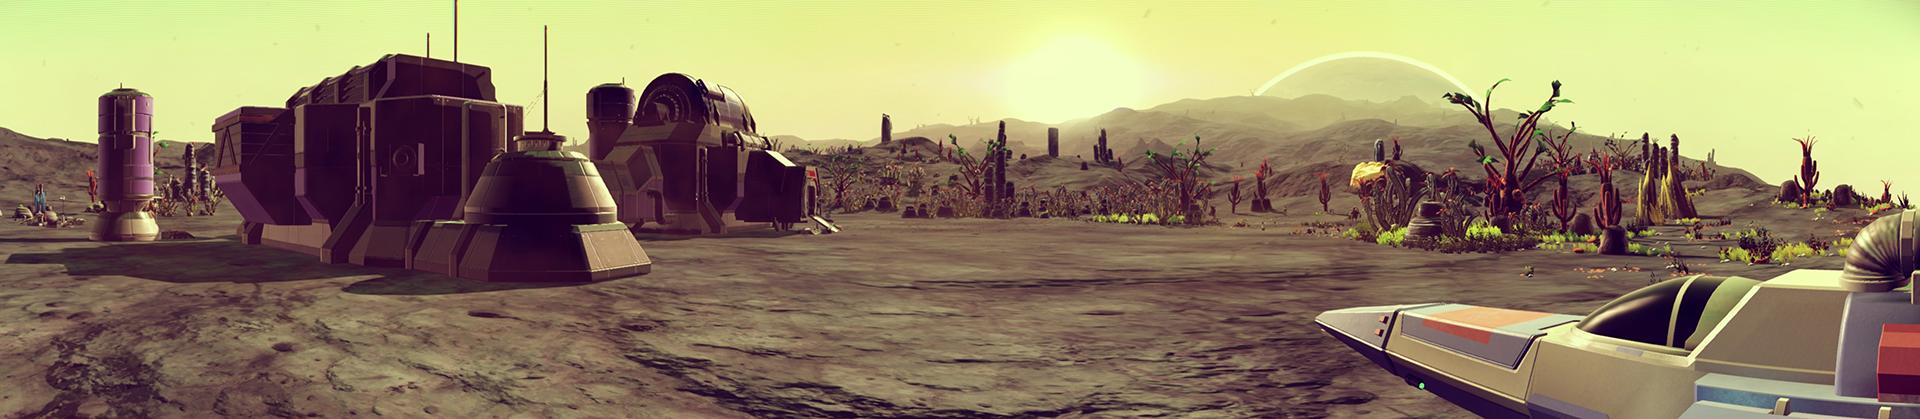 panorama06_resize.png